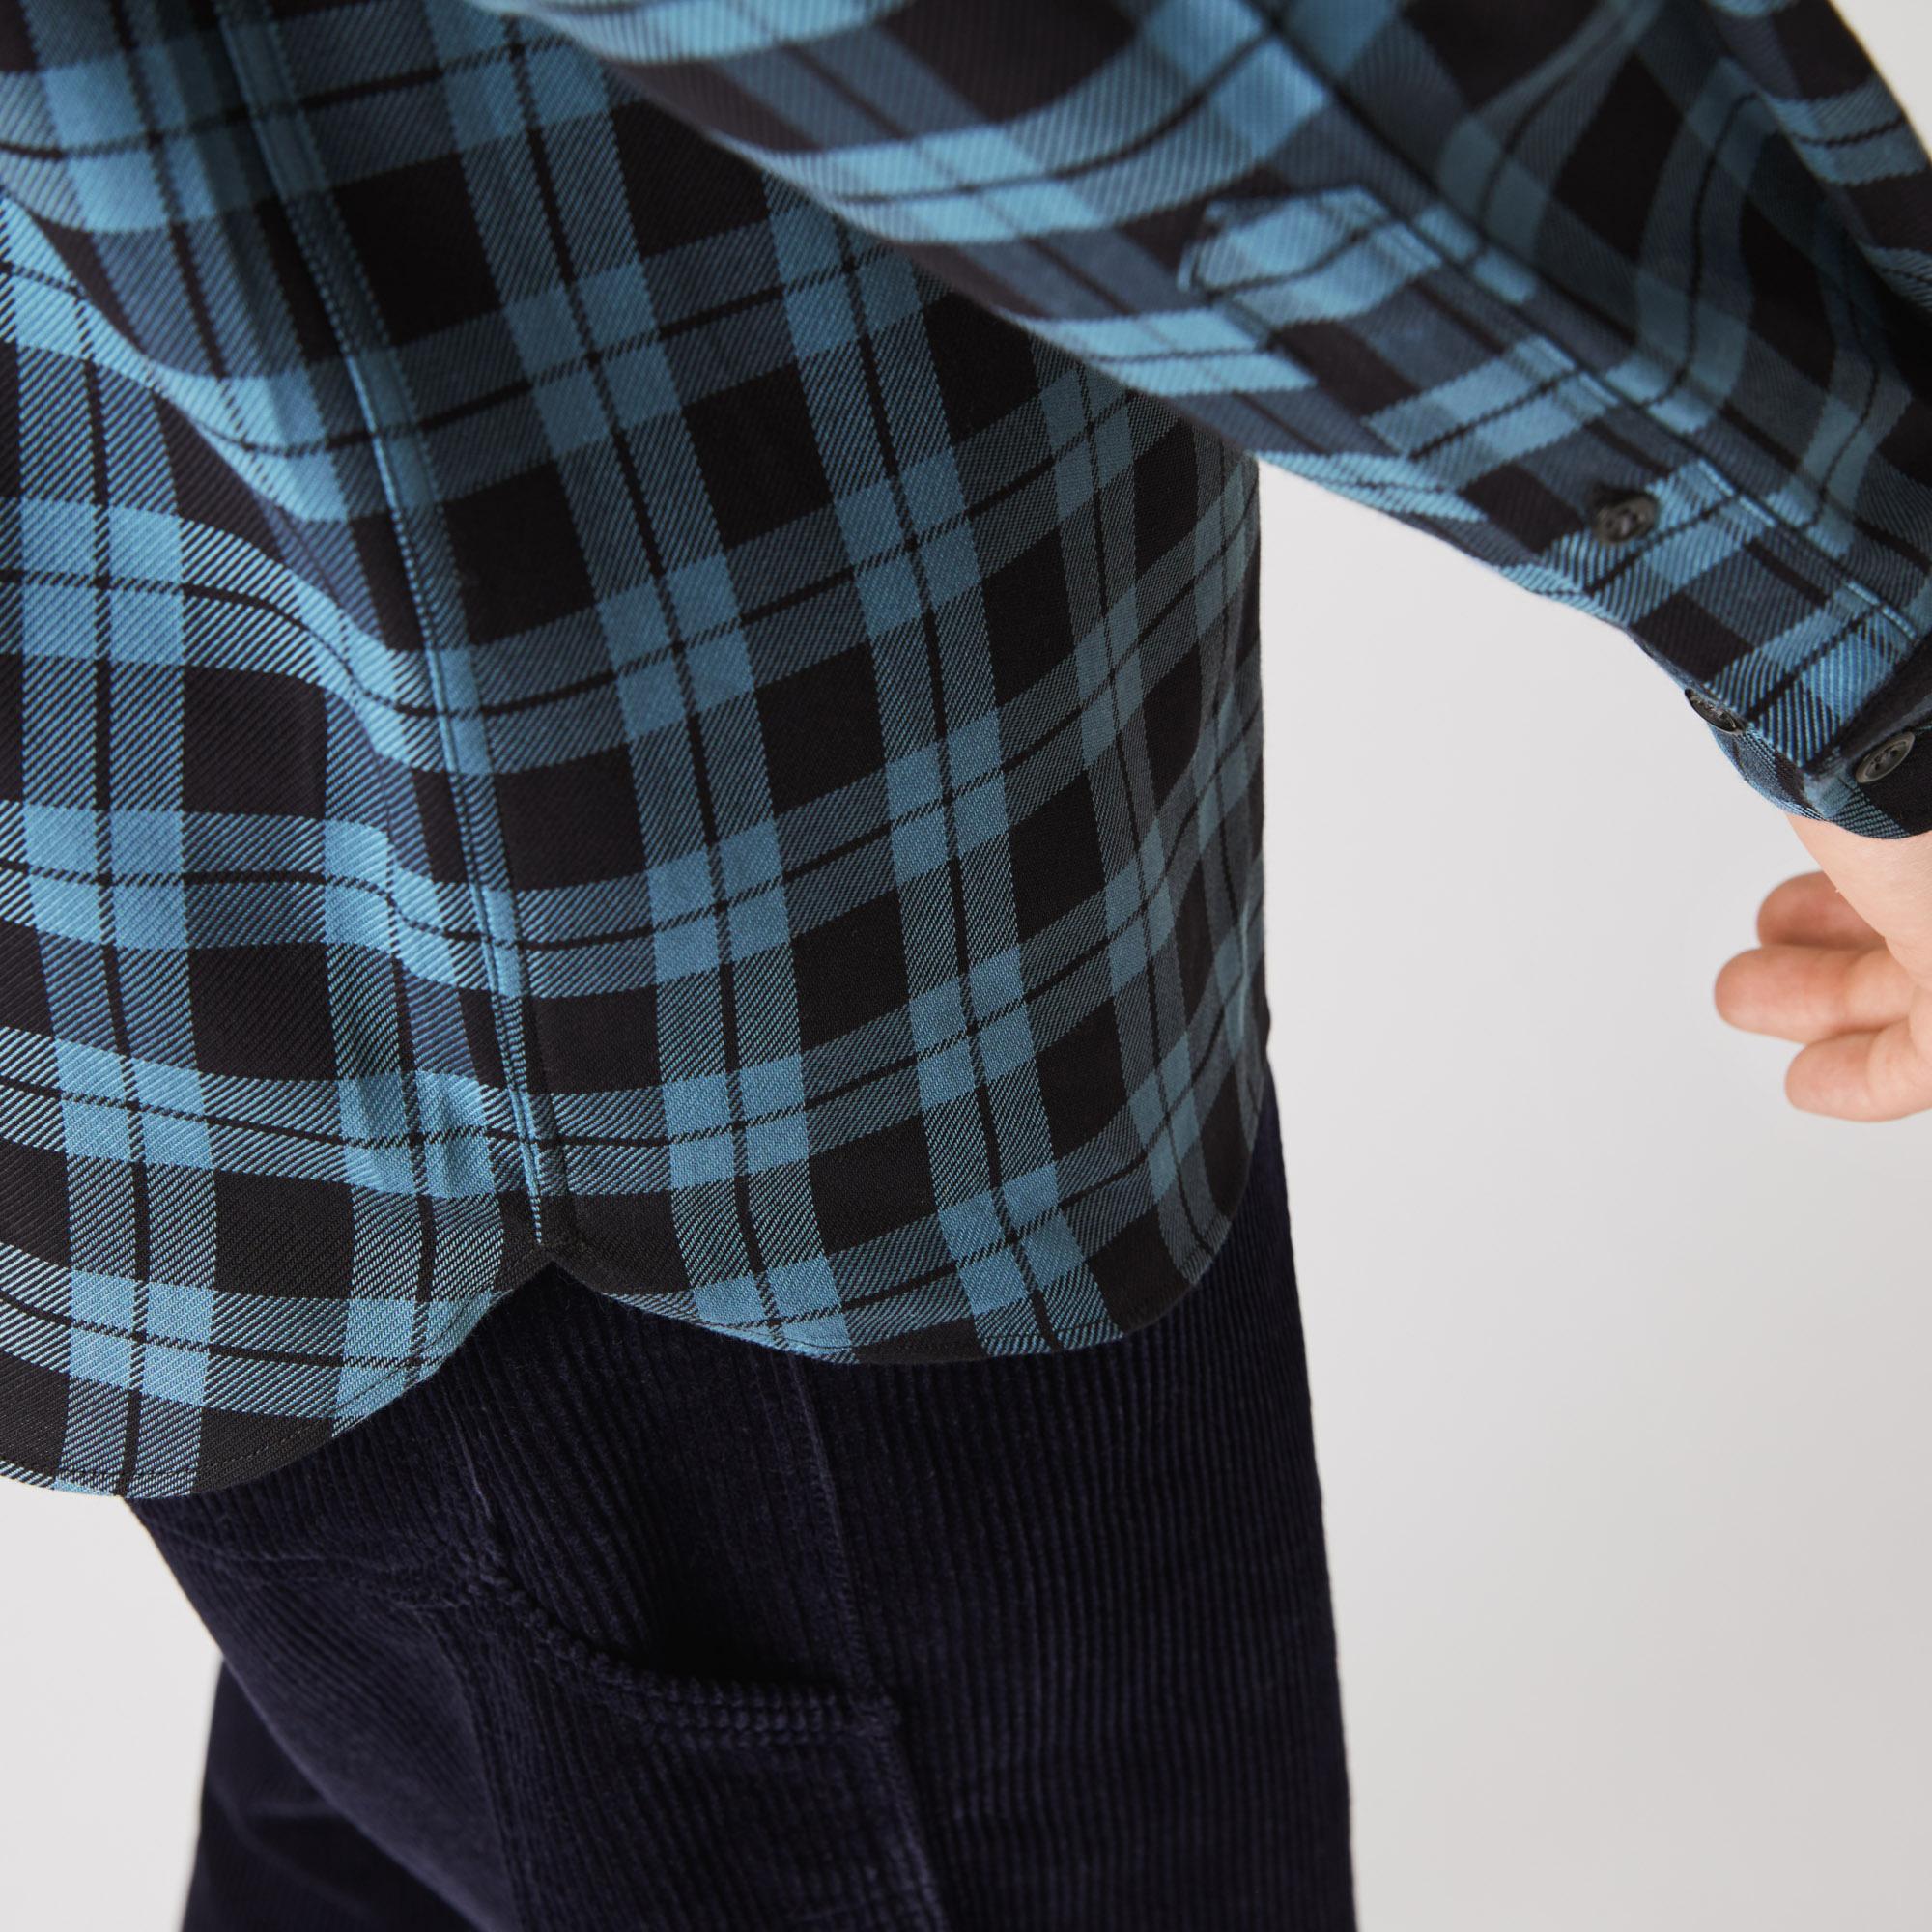 Lacoste L!VE Erkek Regular Fit Ekose Desenli Lacivert Gömlek